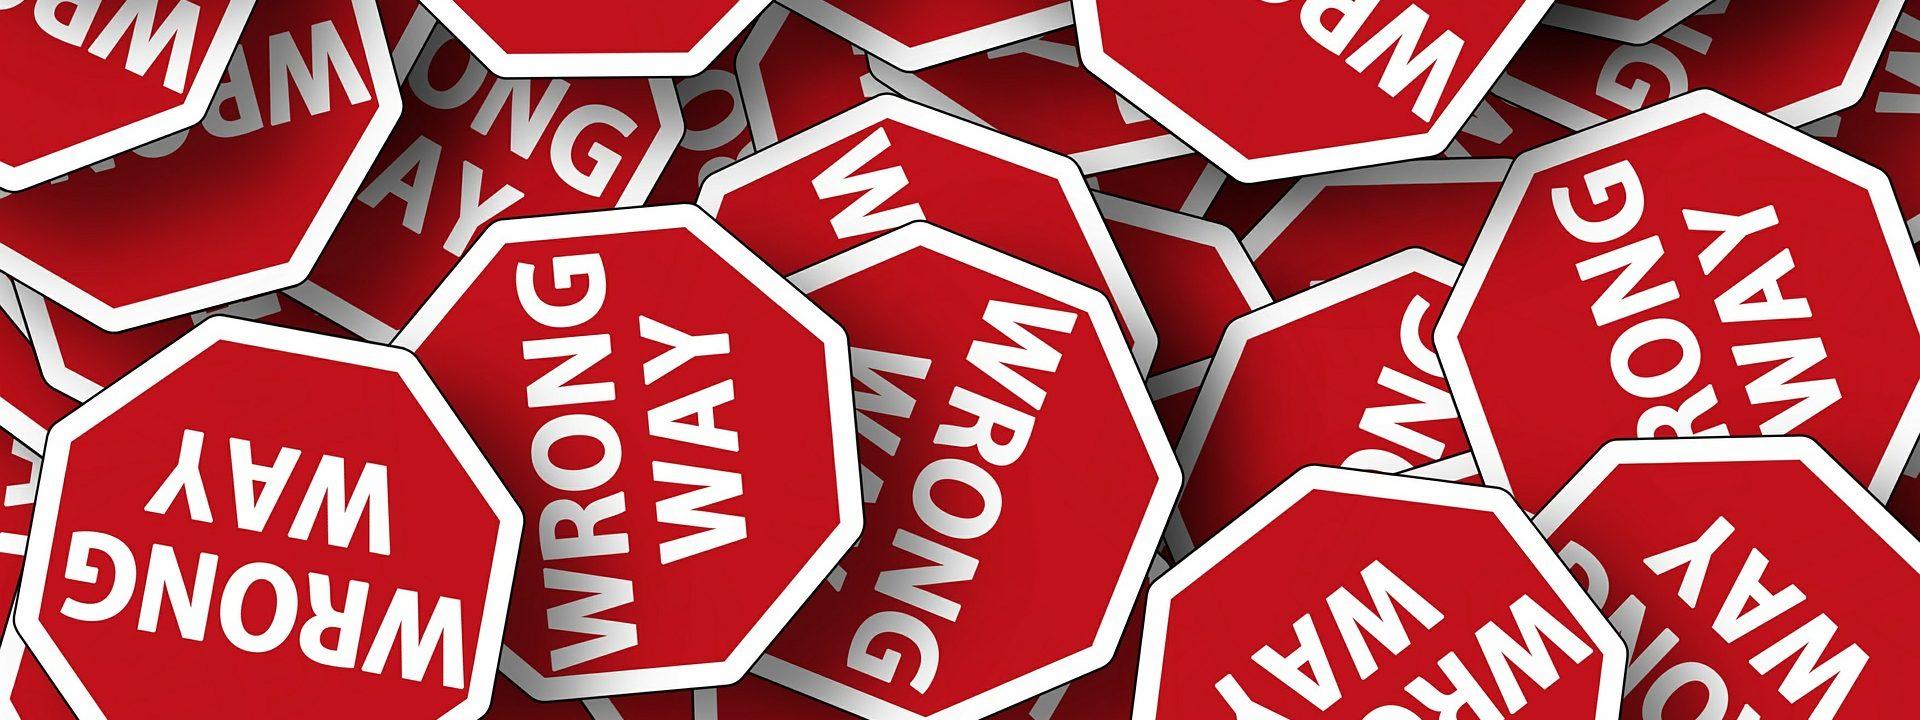 5 errores cognitivos que cometemos